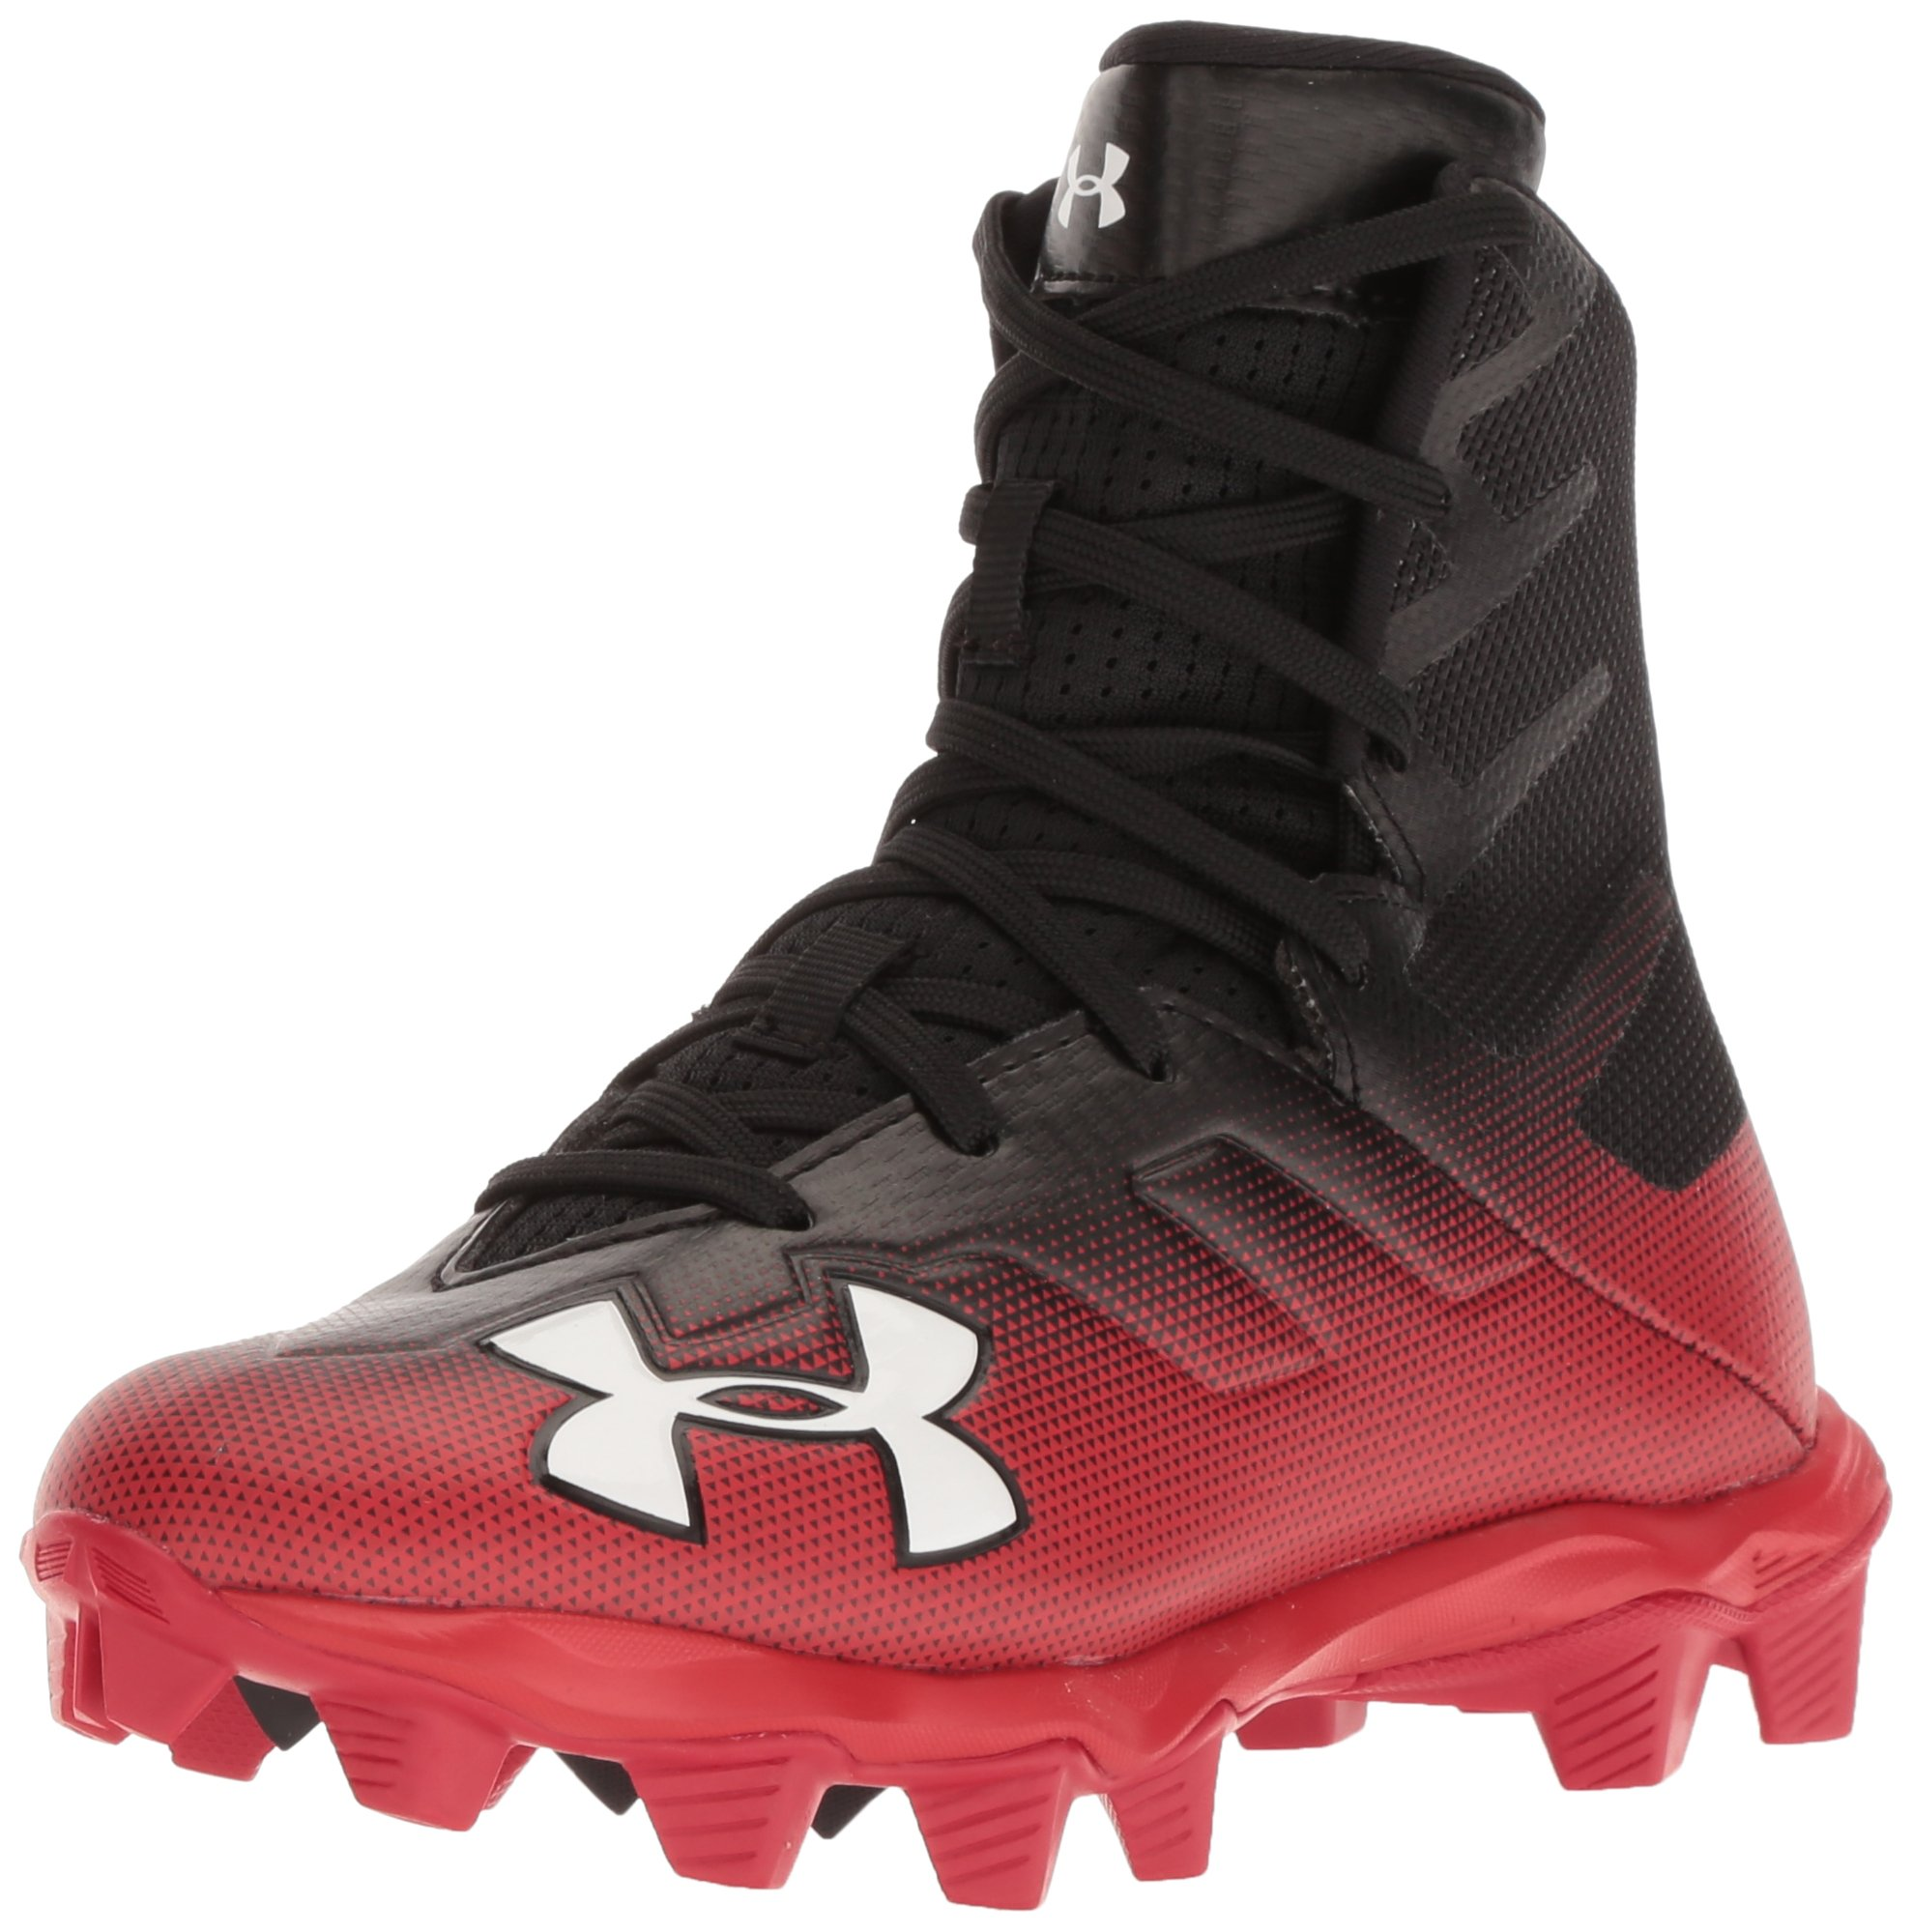 Under Armour Boys' Highlight RM Jr. Football Shoe, Black (003)/Red, 1